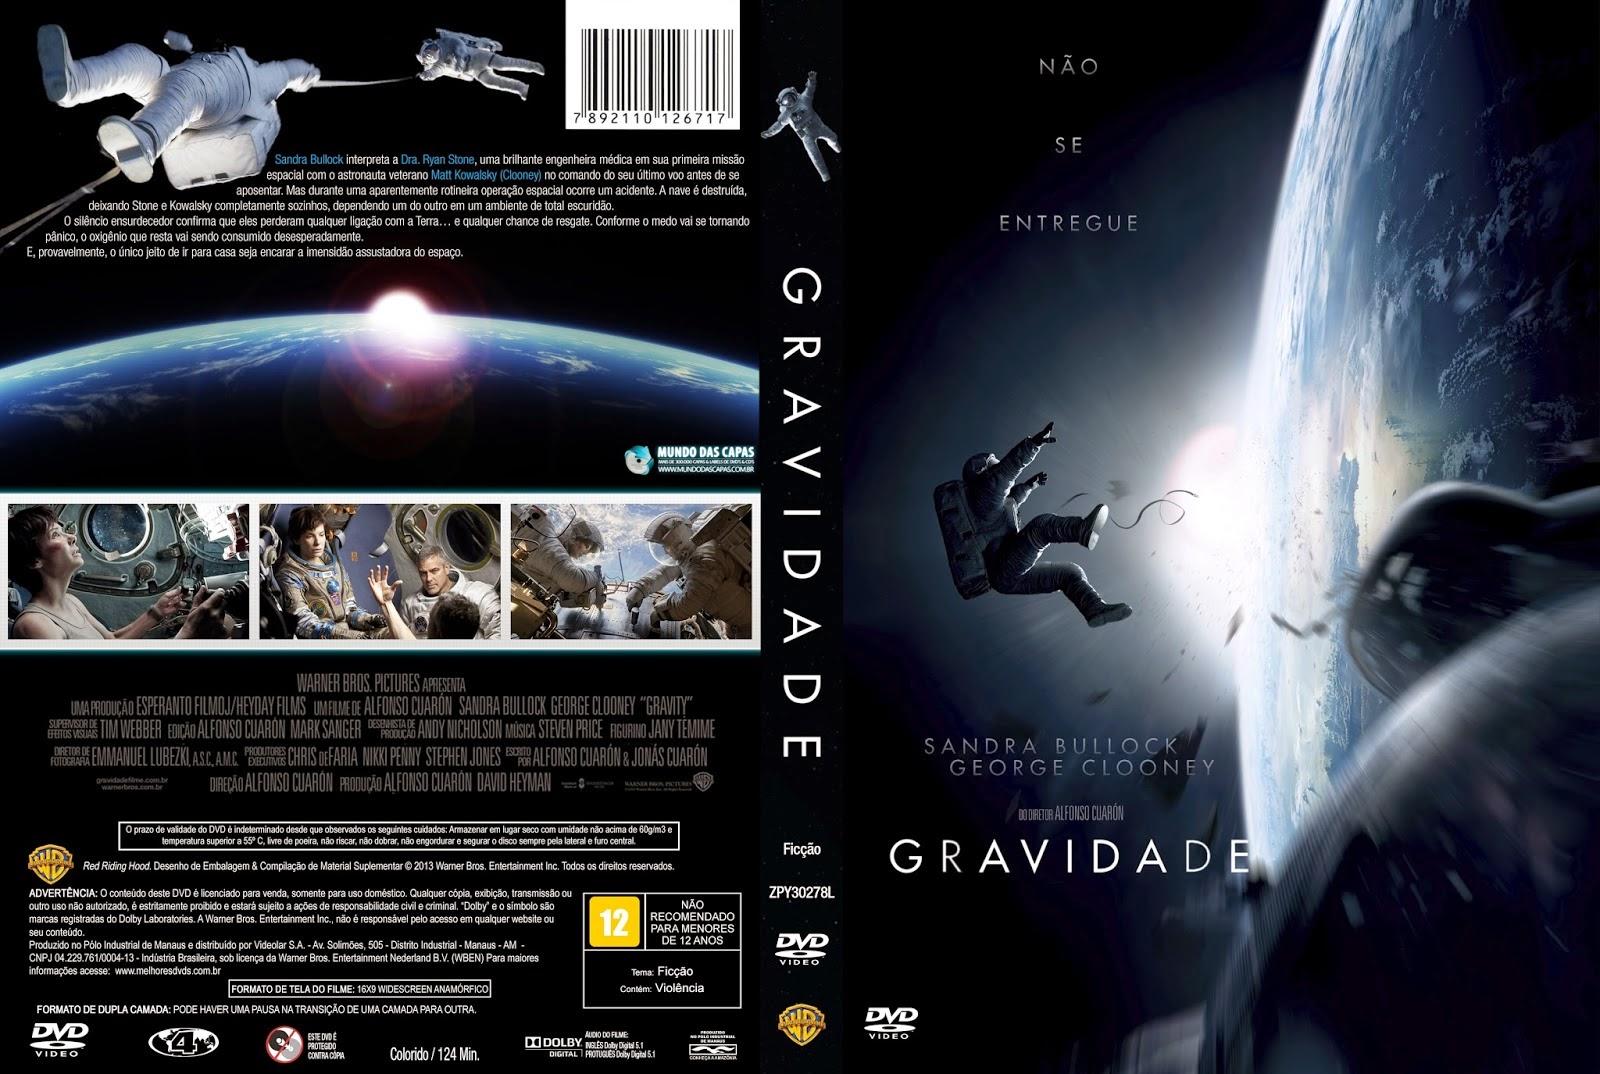 Filme Gravidade DVD Capa